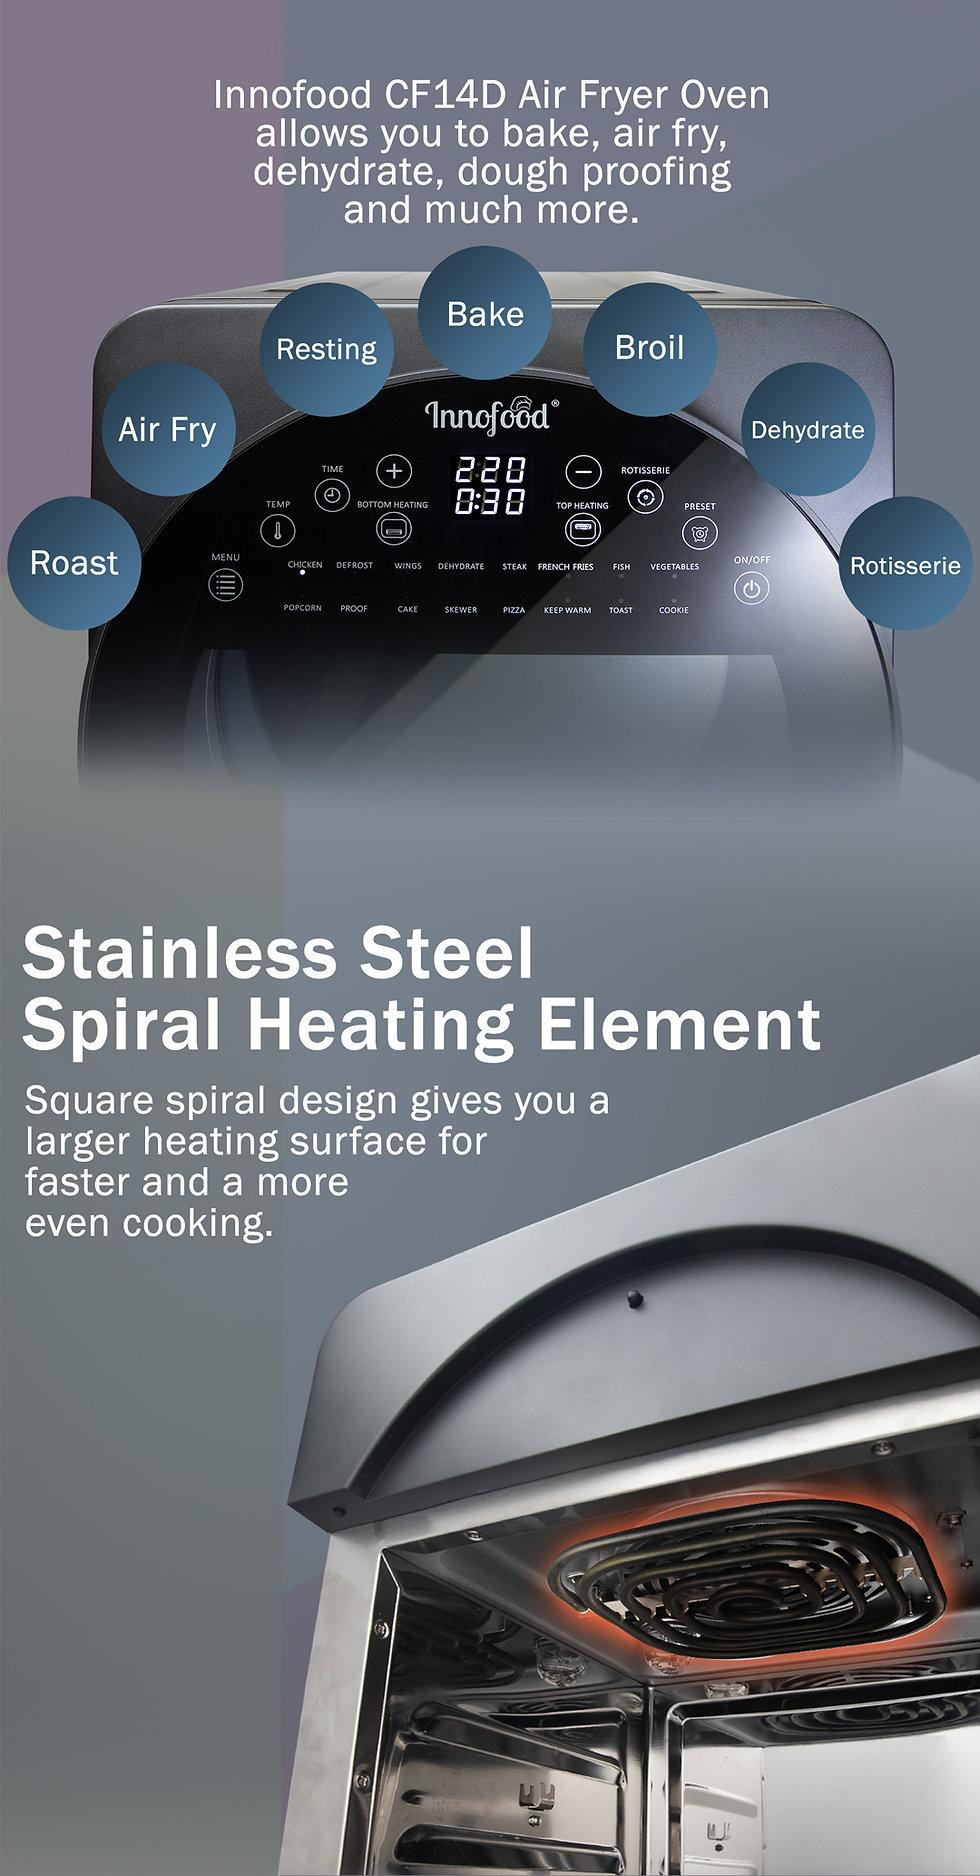 Innofood Digital Air Fryer Oven